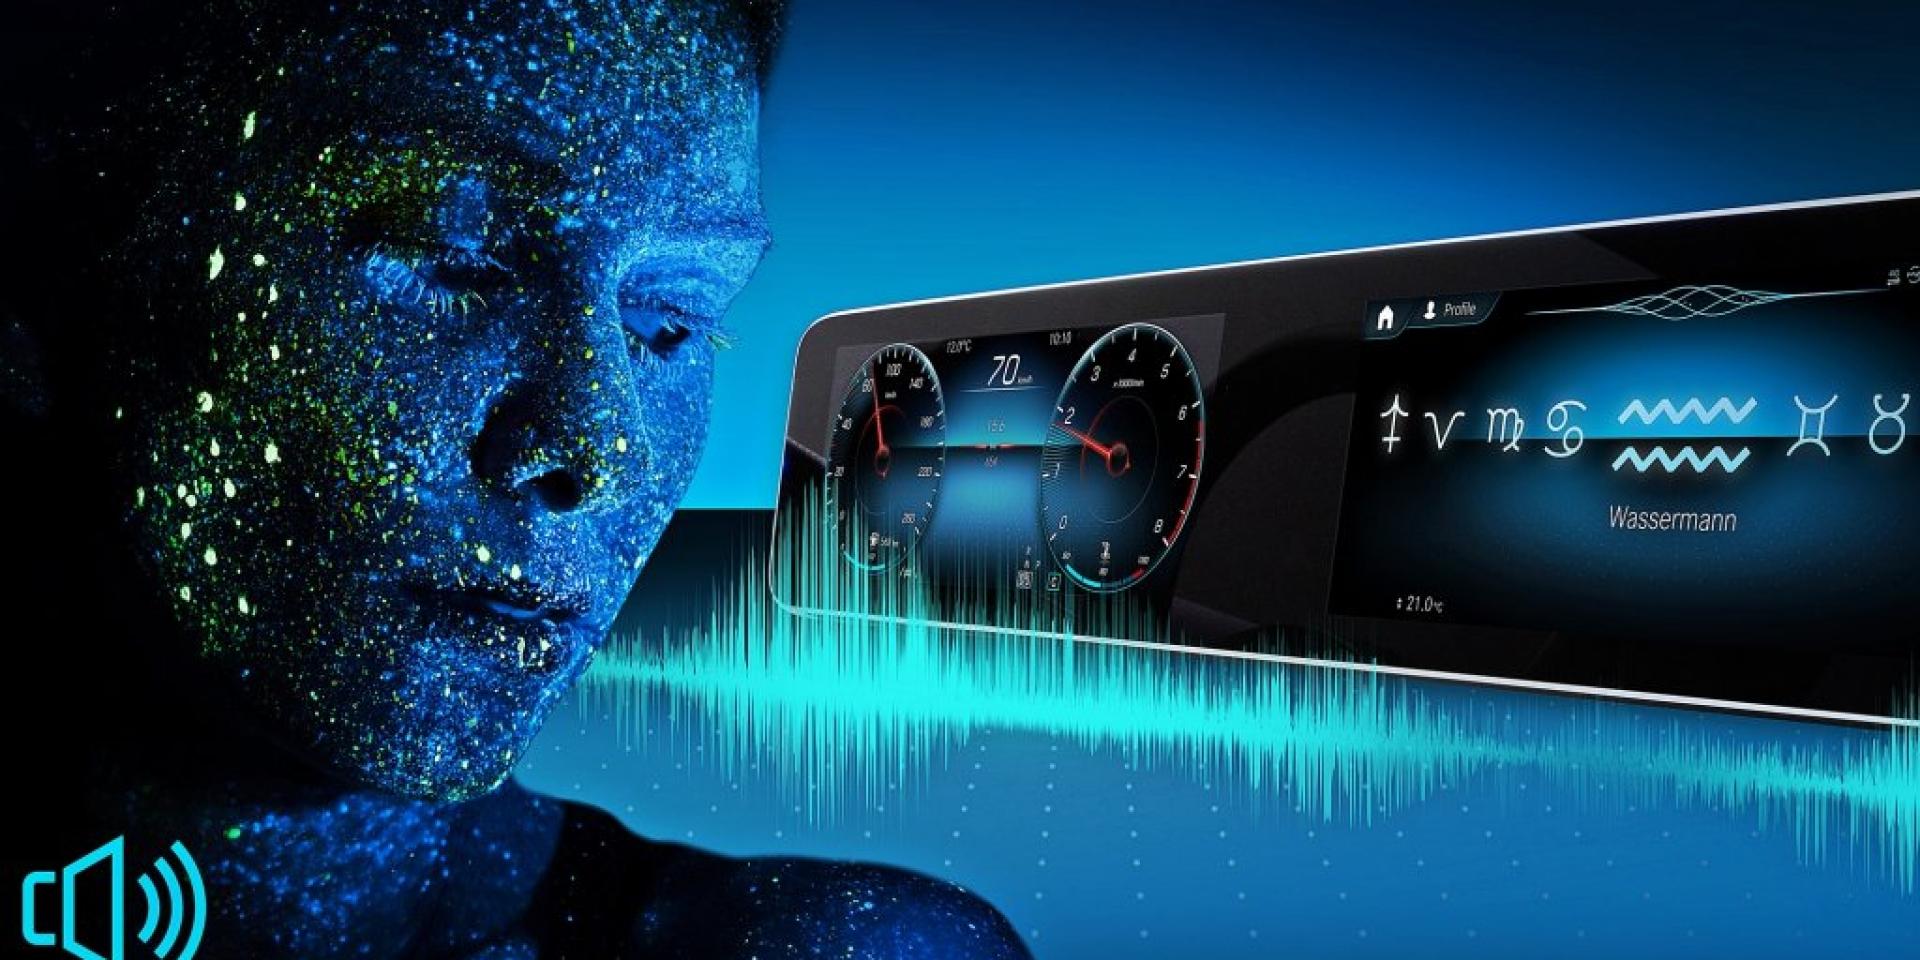 Mercedes-Benz積極研發車機系統!未來可能比汽車還要賺錢!